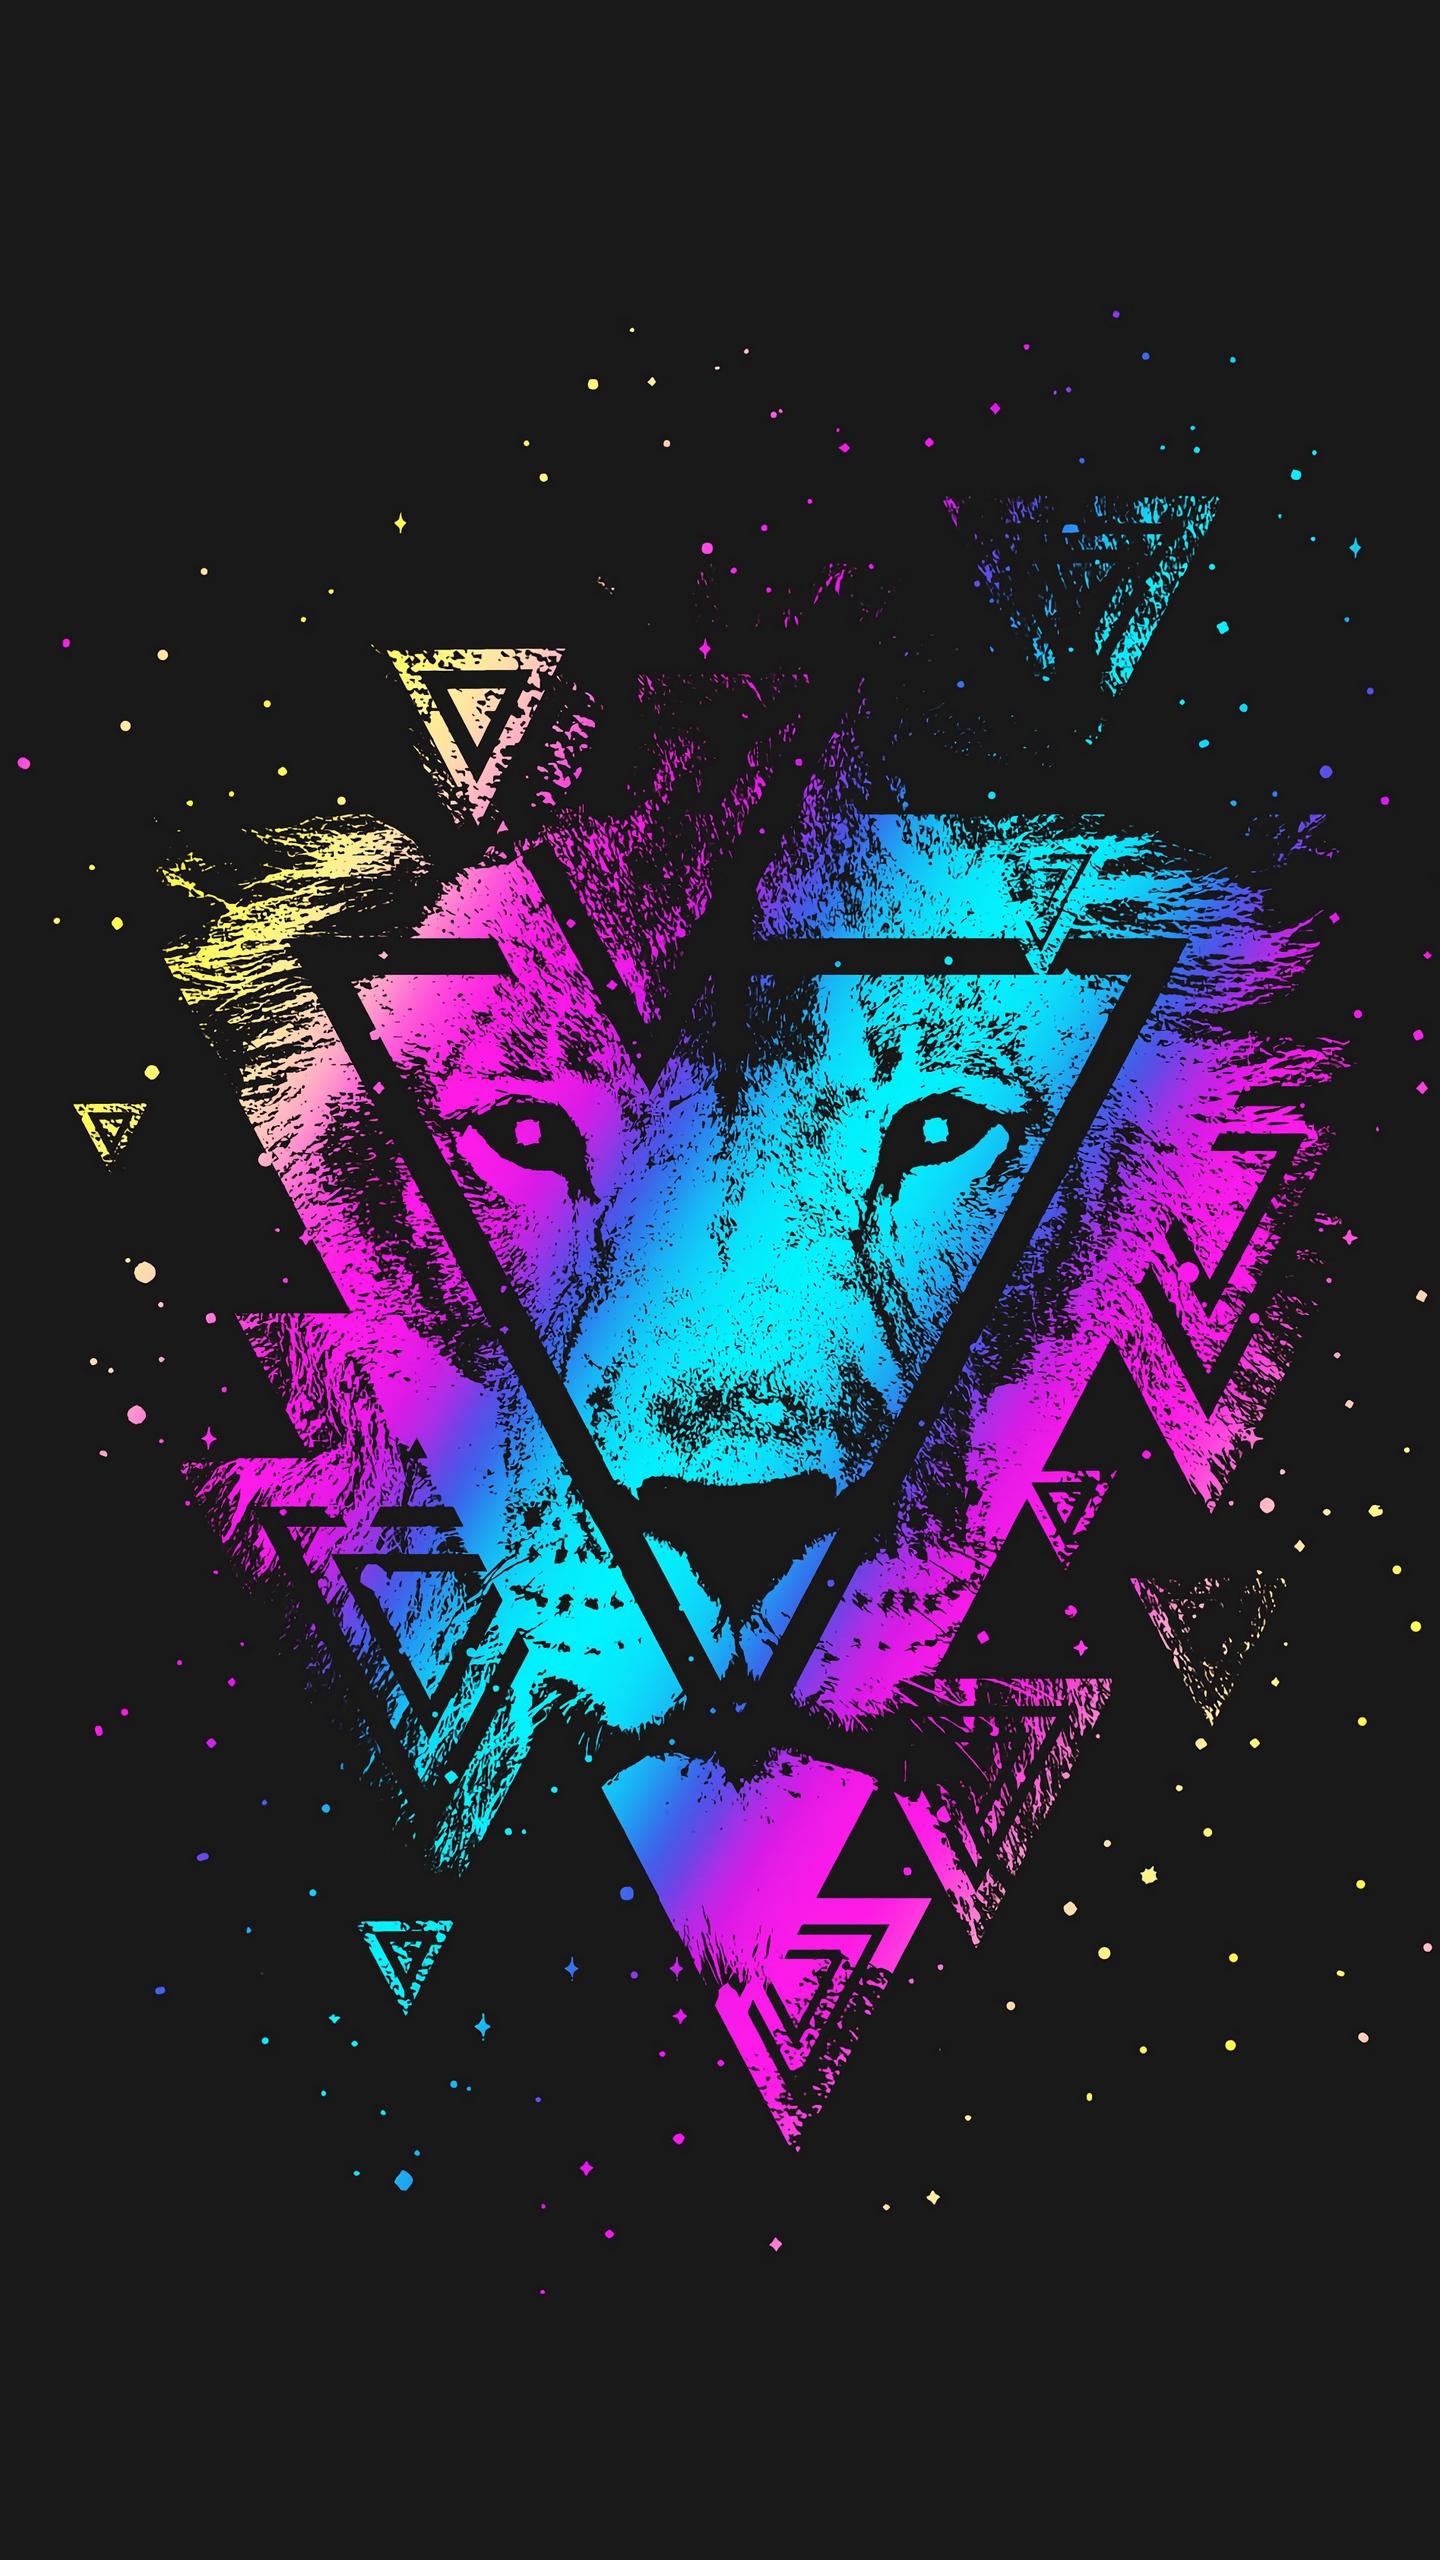 Wallpaper Lion, Colorful, Triangle, Art, Muzzle - Colorful Lion Hd Wallpaper Iphone - HD Wallpaper